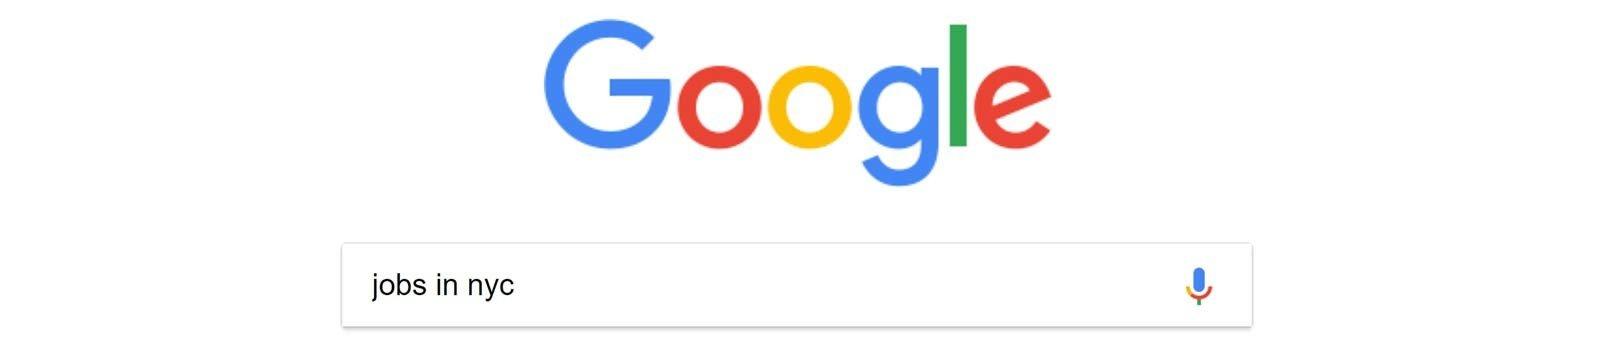 google seachbox